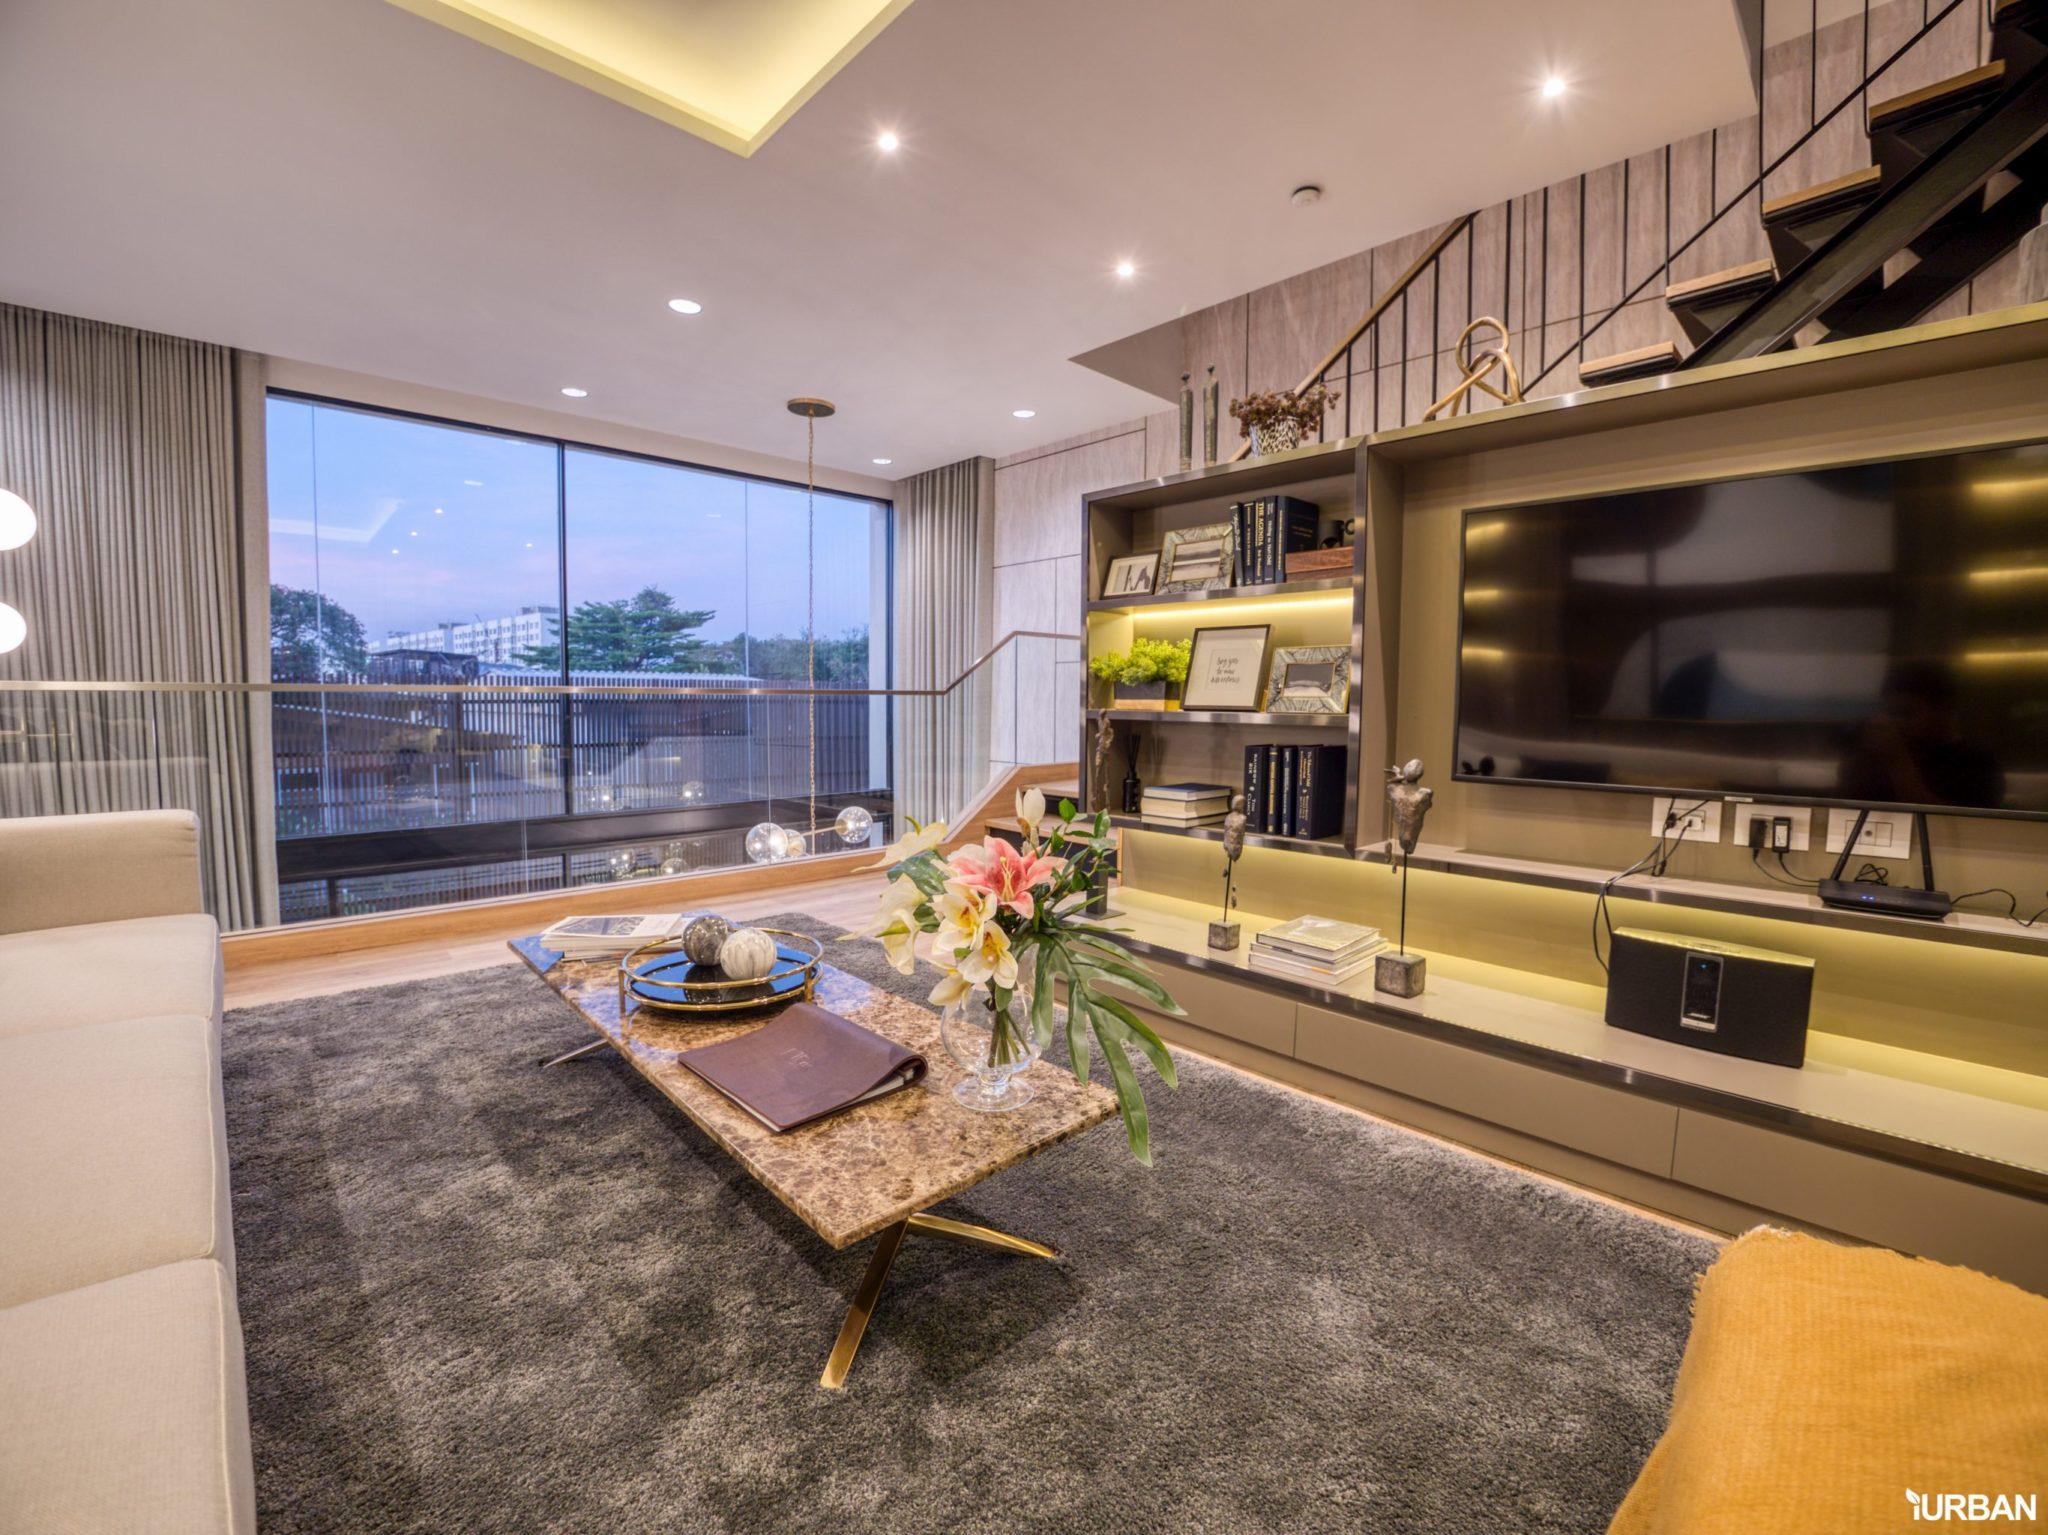 AIRES RAMA9 รีวิว Luxury Townhome 3.5 ชั้น + Rooftop ออกแบบสวย ย่านพระราม9 (ใกล้ รพ.สมิติเวช) 40 - AIRES